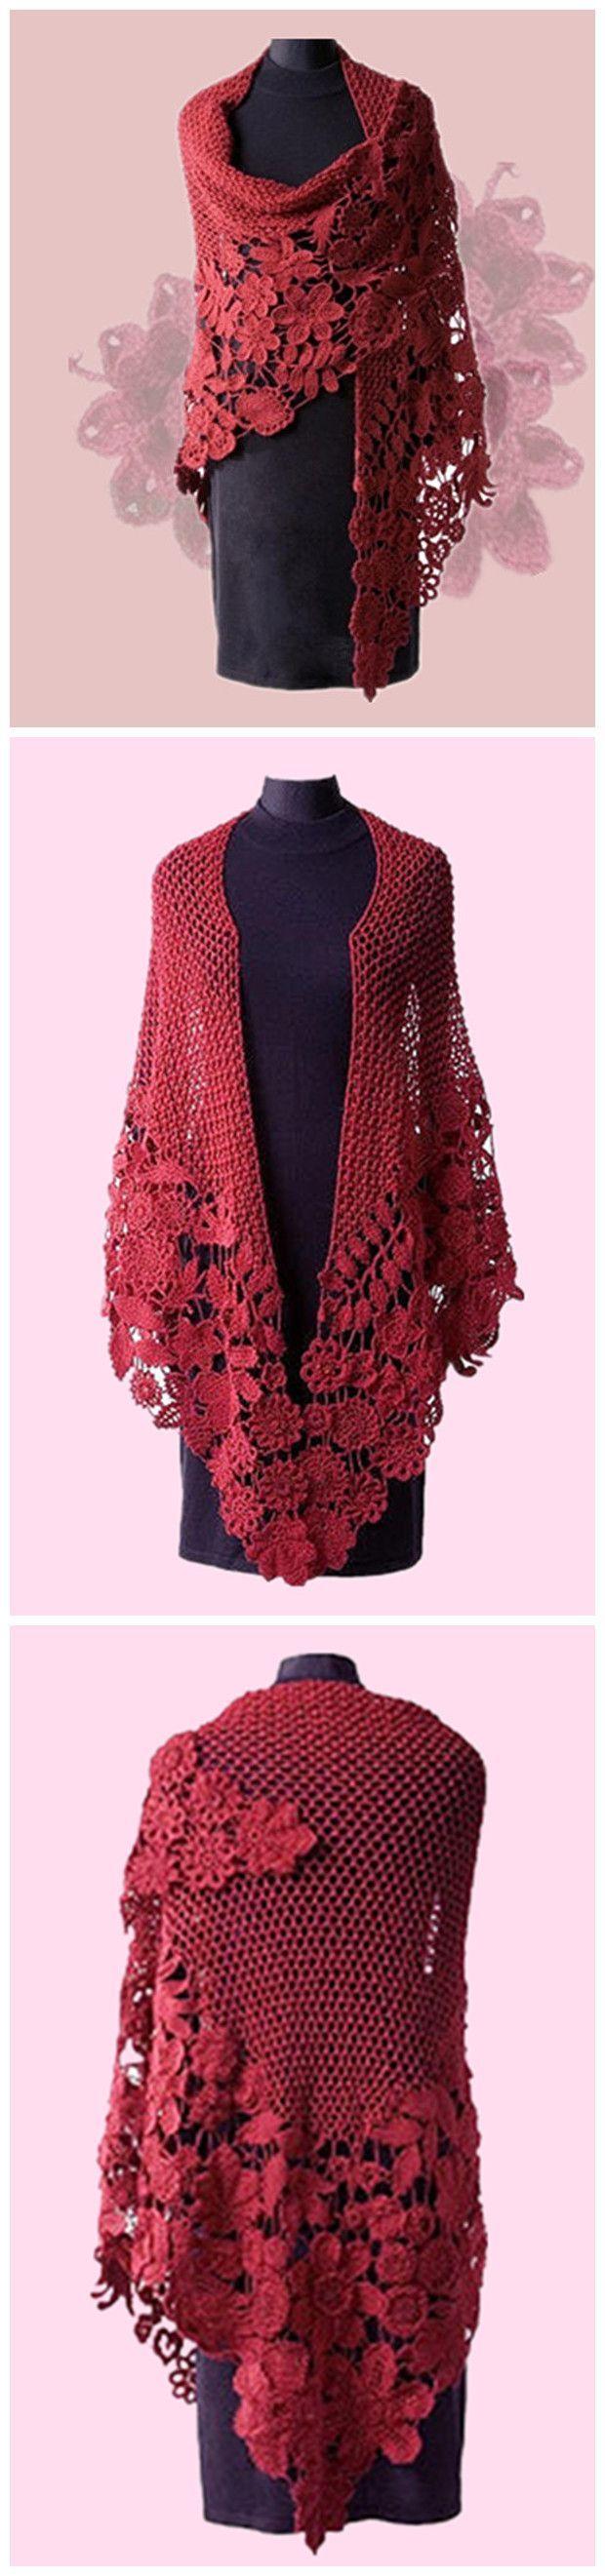 Elegant long crocheted shawl.: